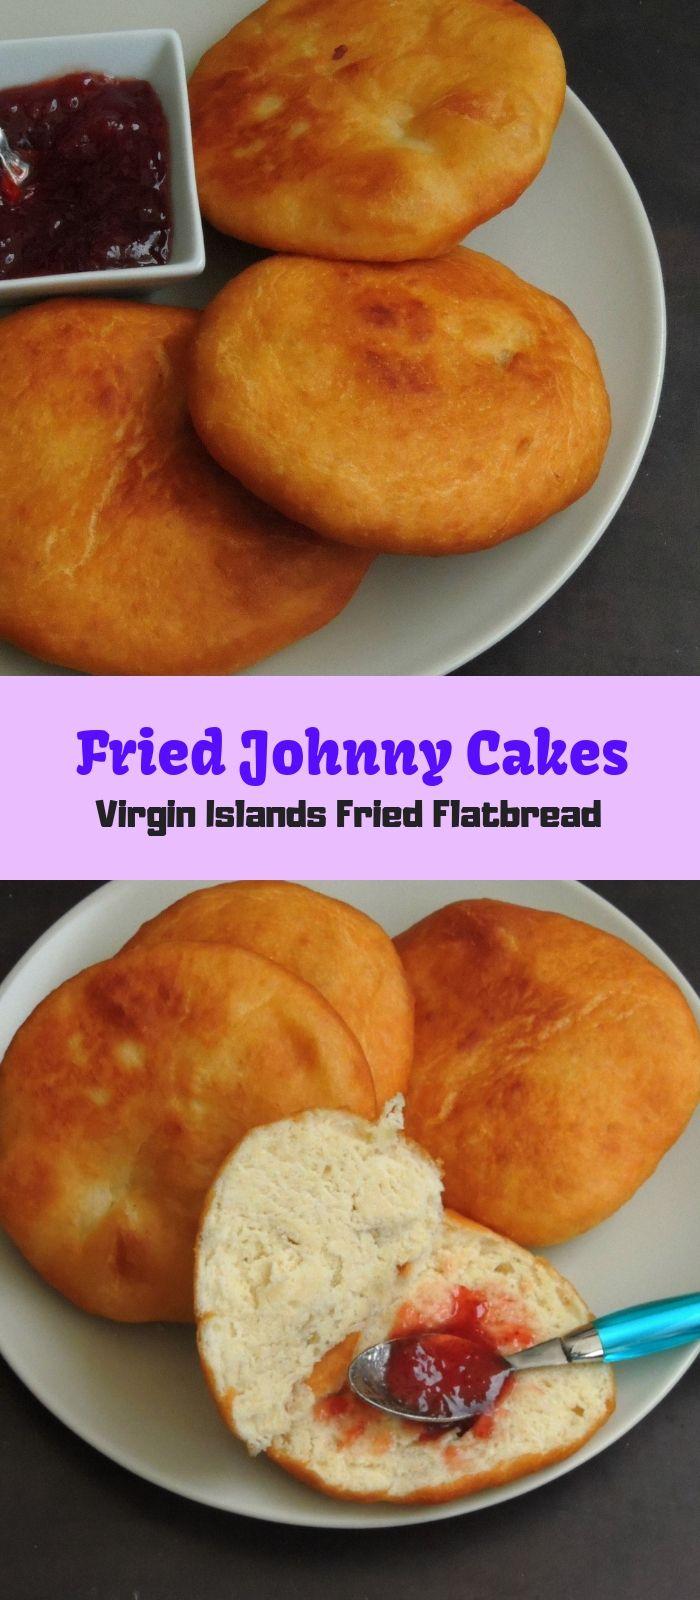 Virgin Islands Johnny Cake/Fried Johnny Cakes